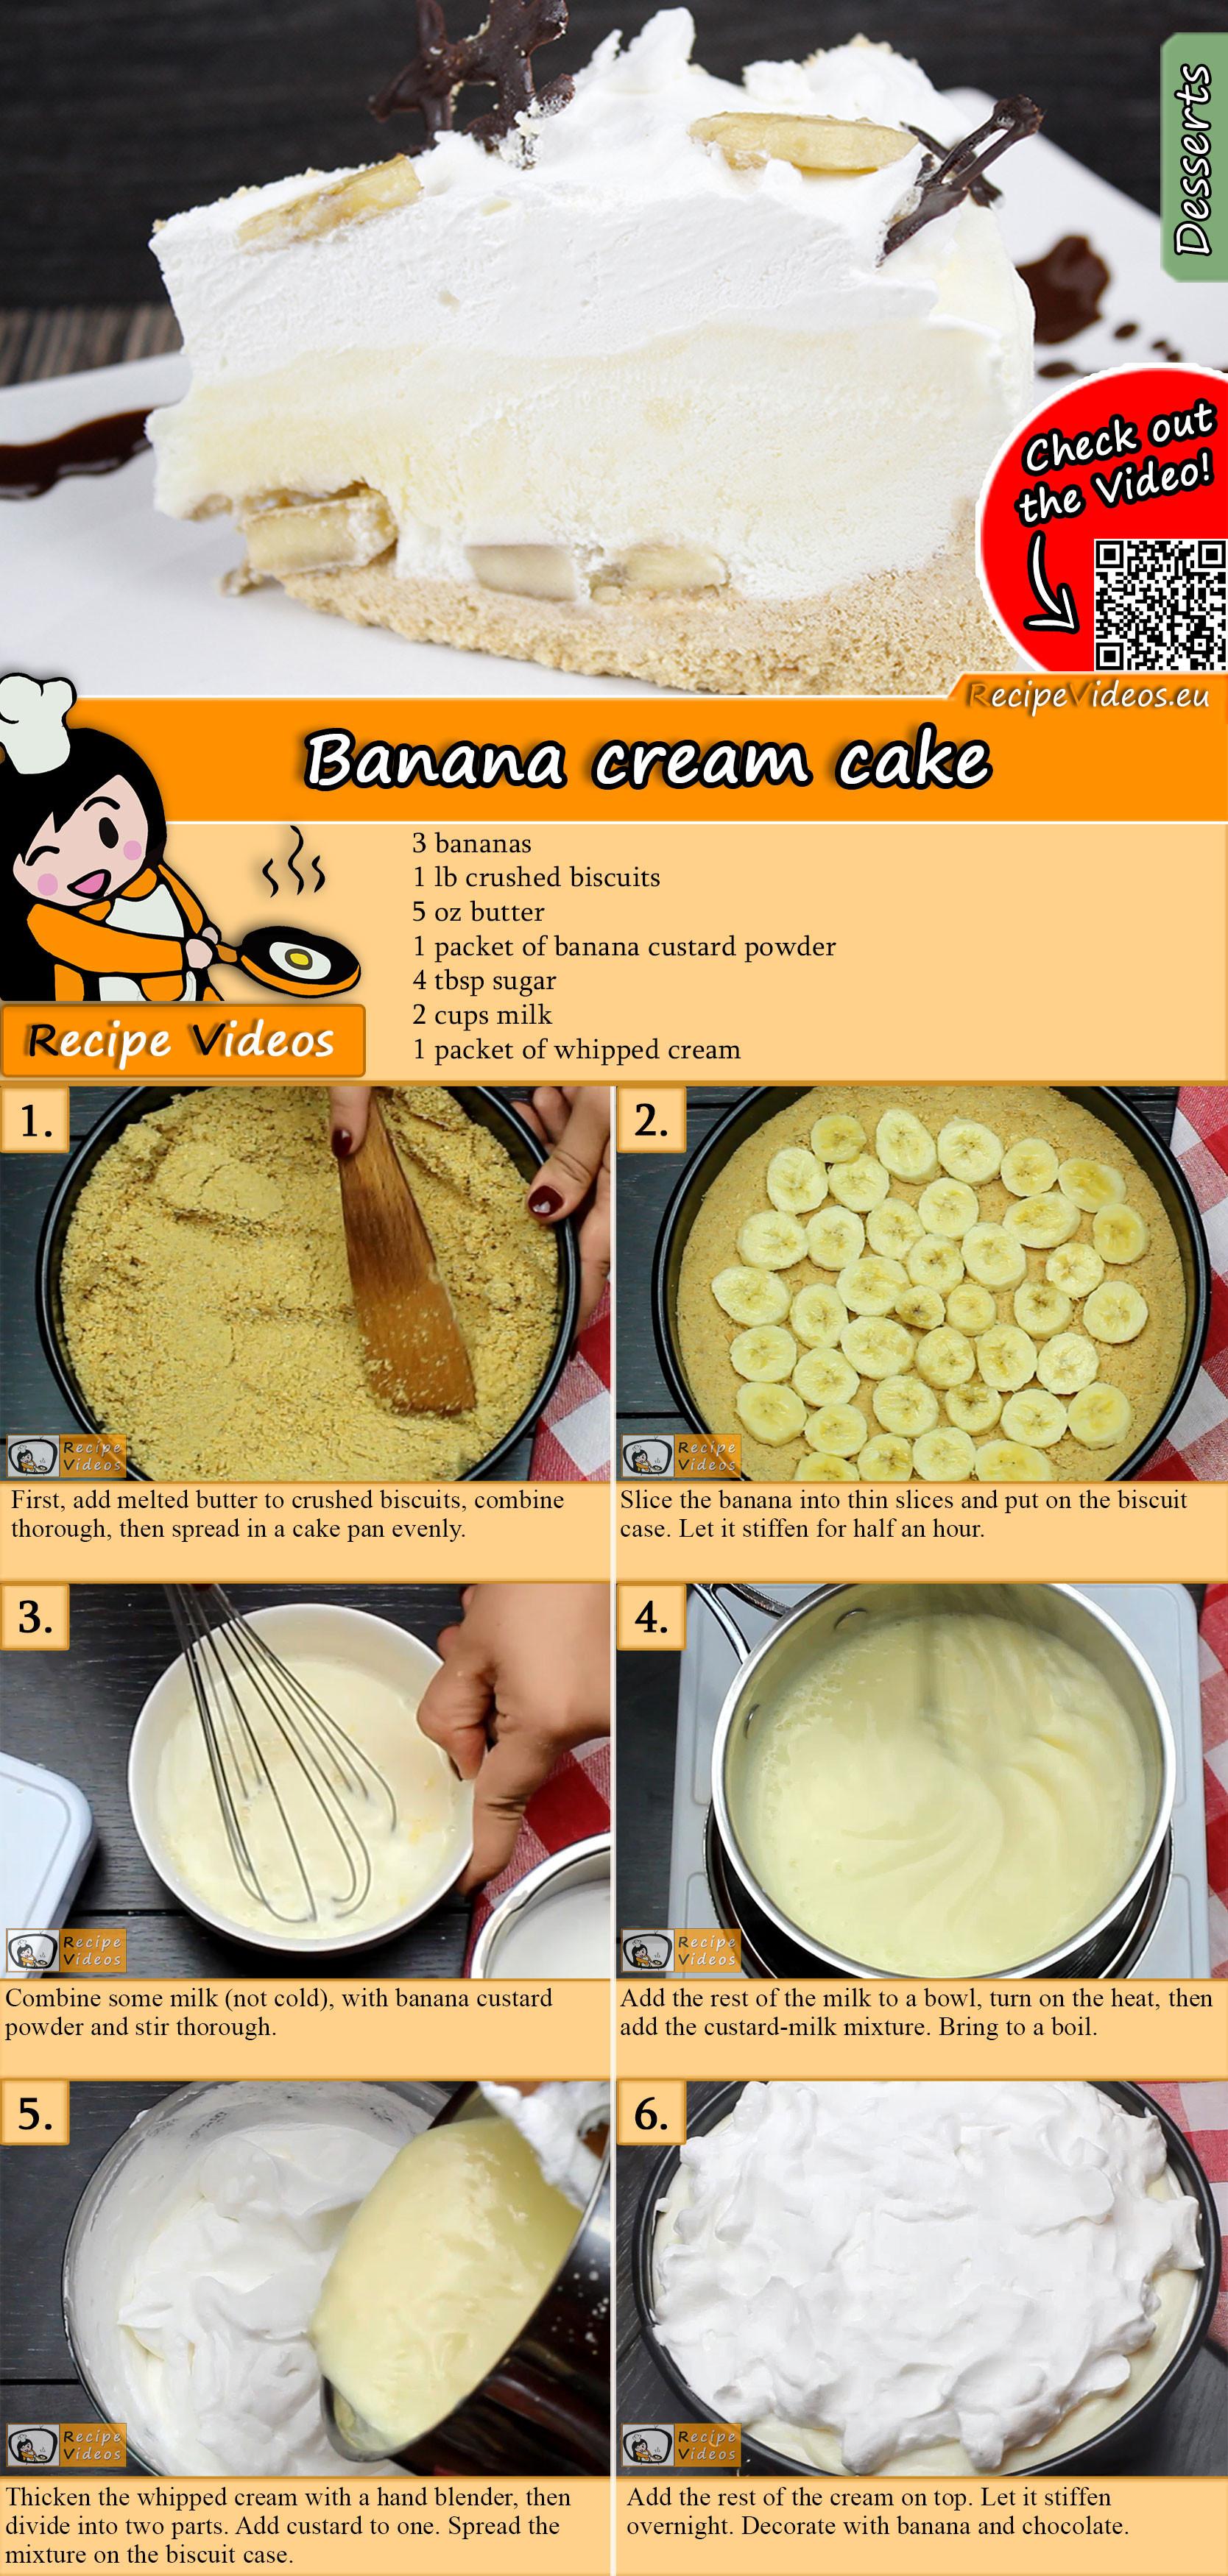 Banana cream cake recipe with video